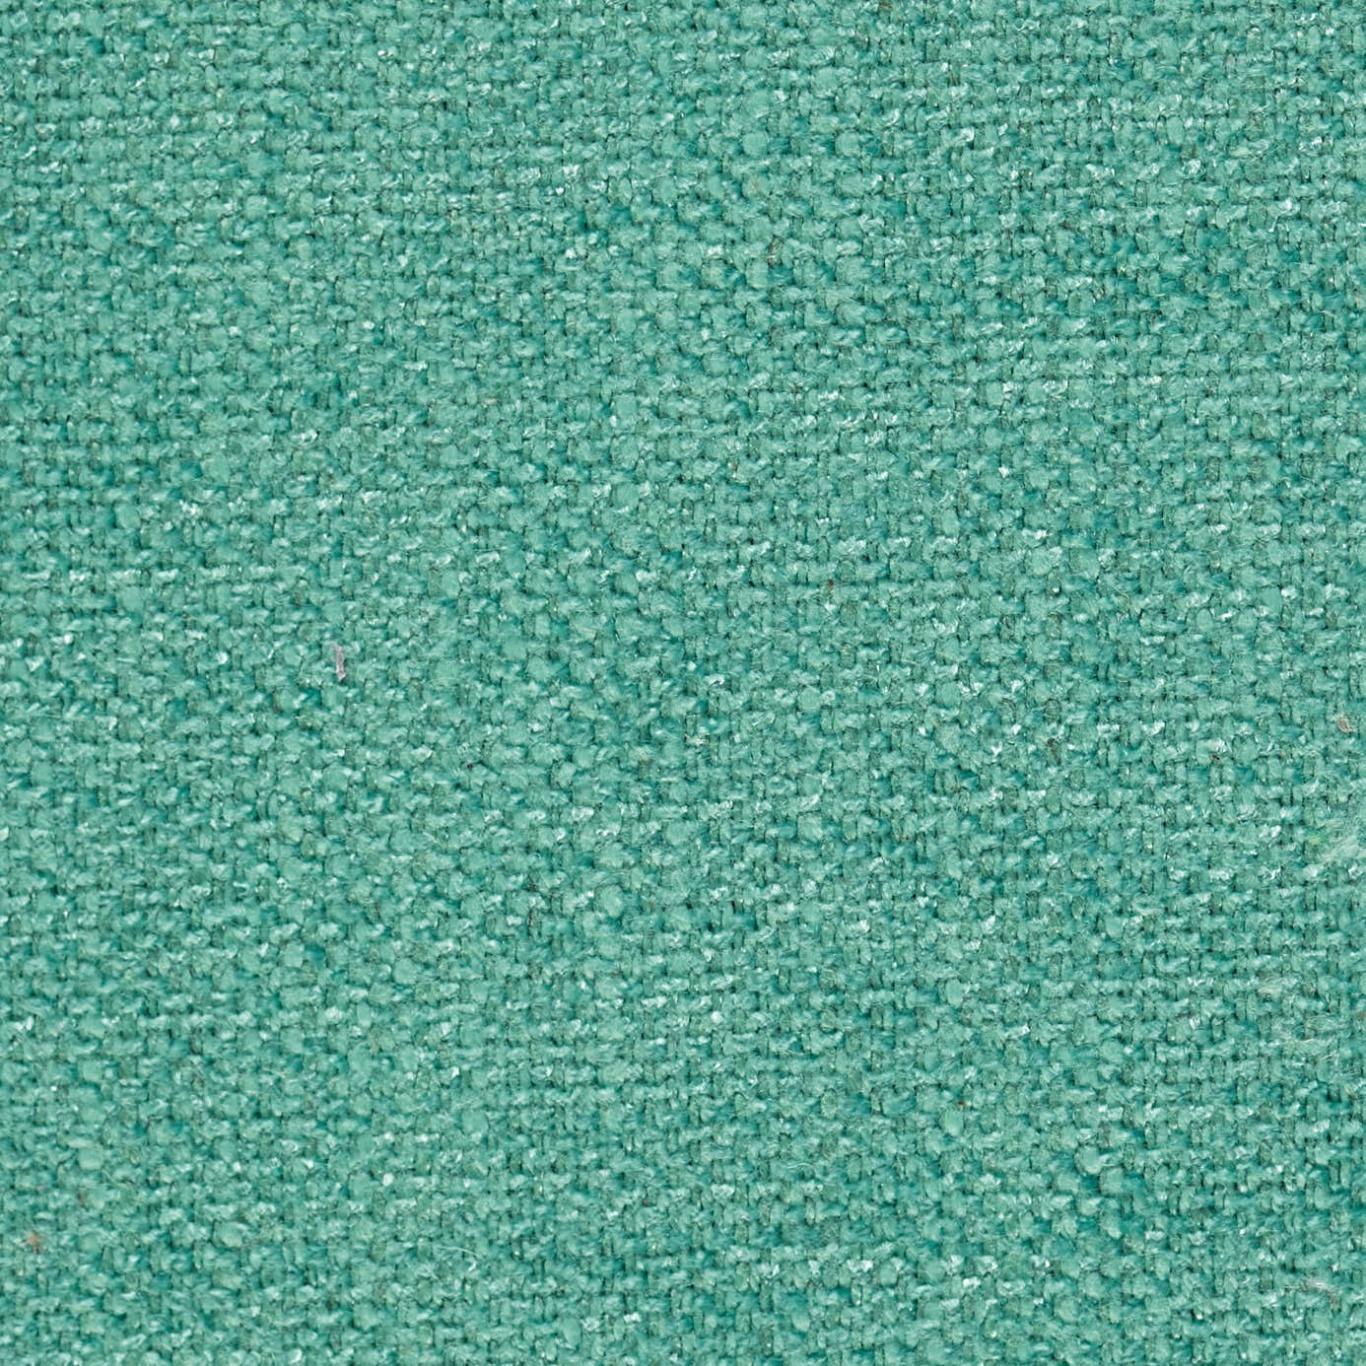 Image of Harlequin Molecule Marine Fabric 440176